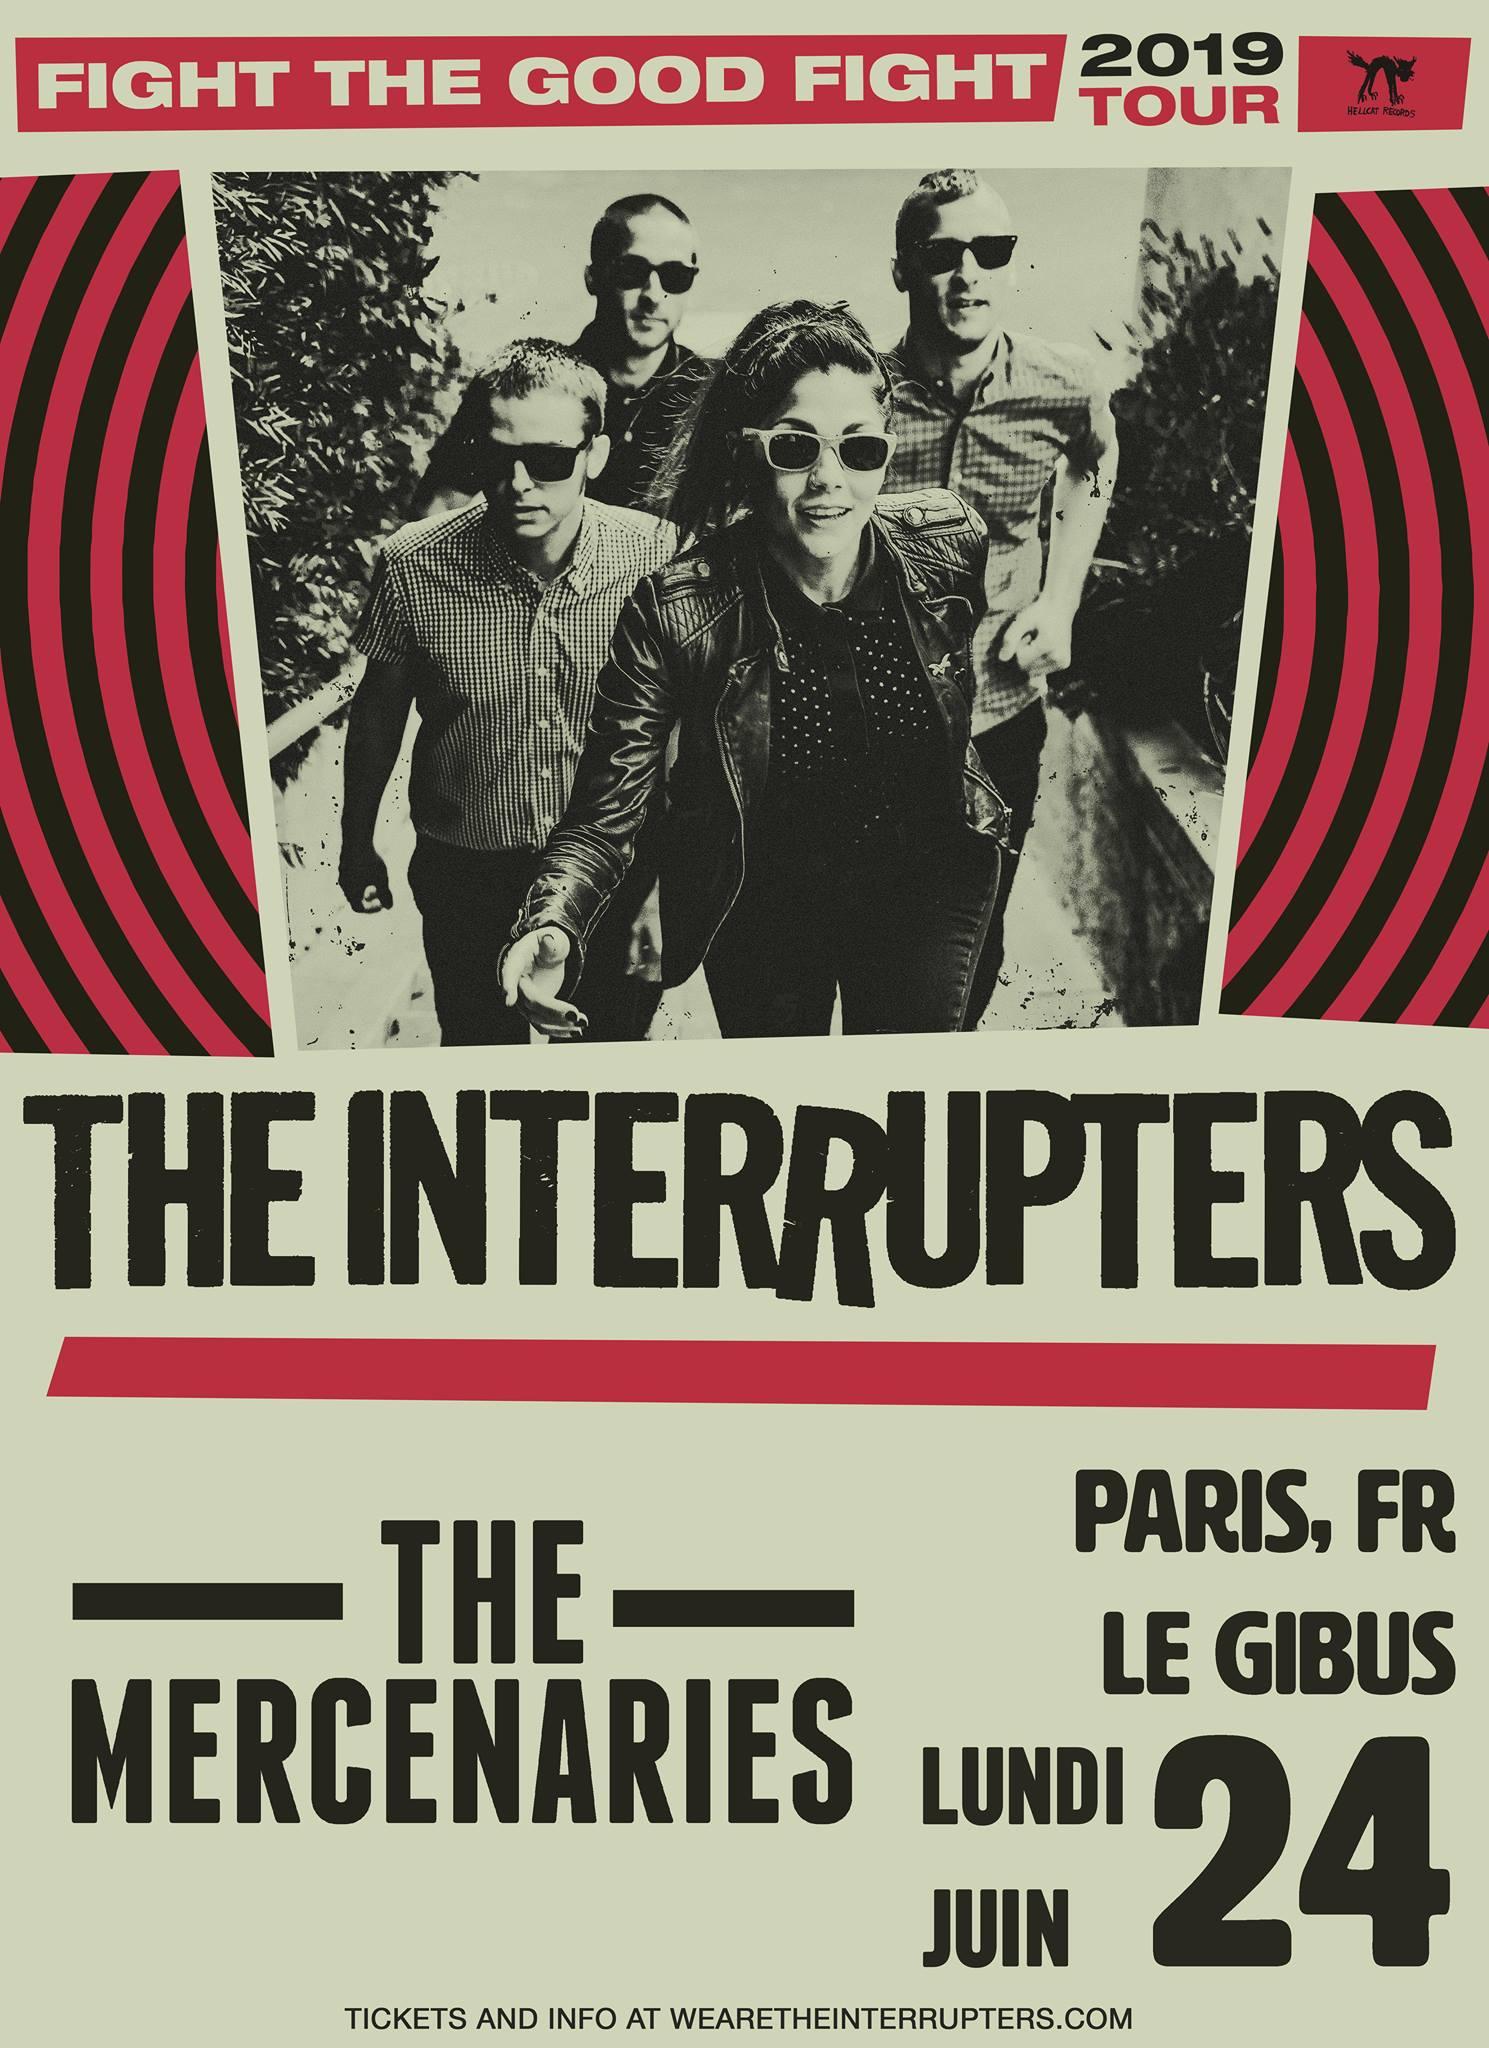 24.06.2019 – The Interrupters + The Mercenaries